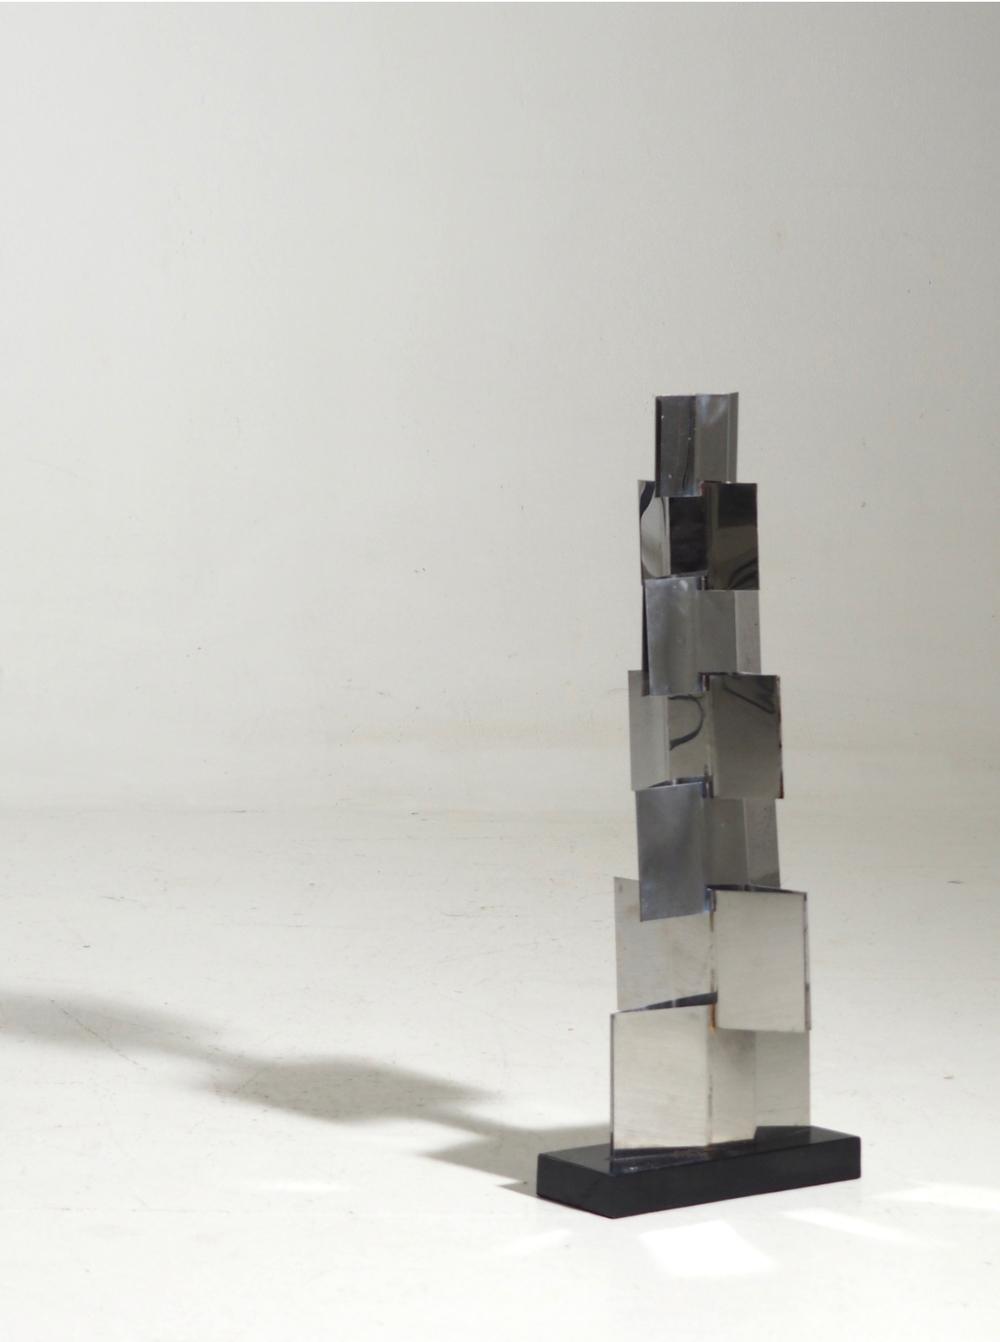 Stainless steel sculpture, Circa 1930 - 1960.